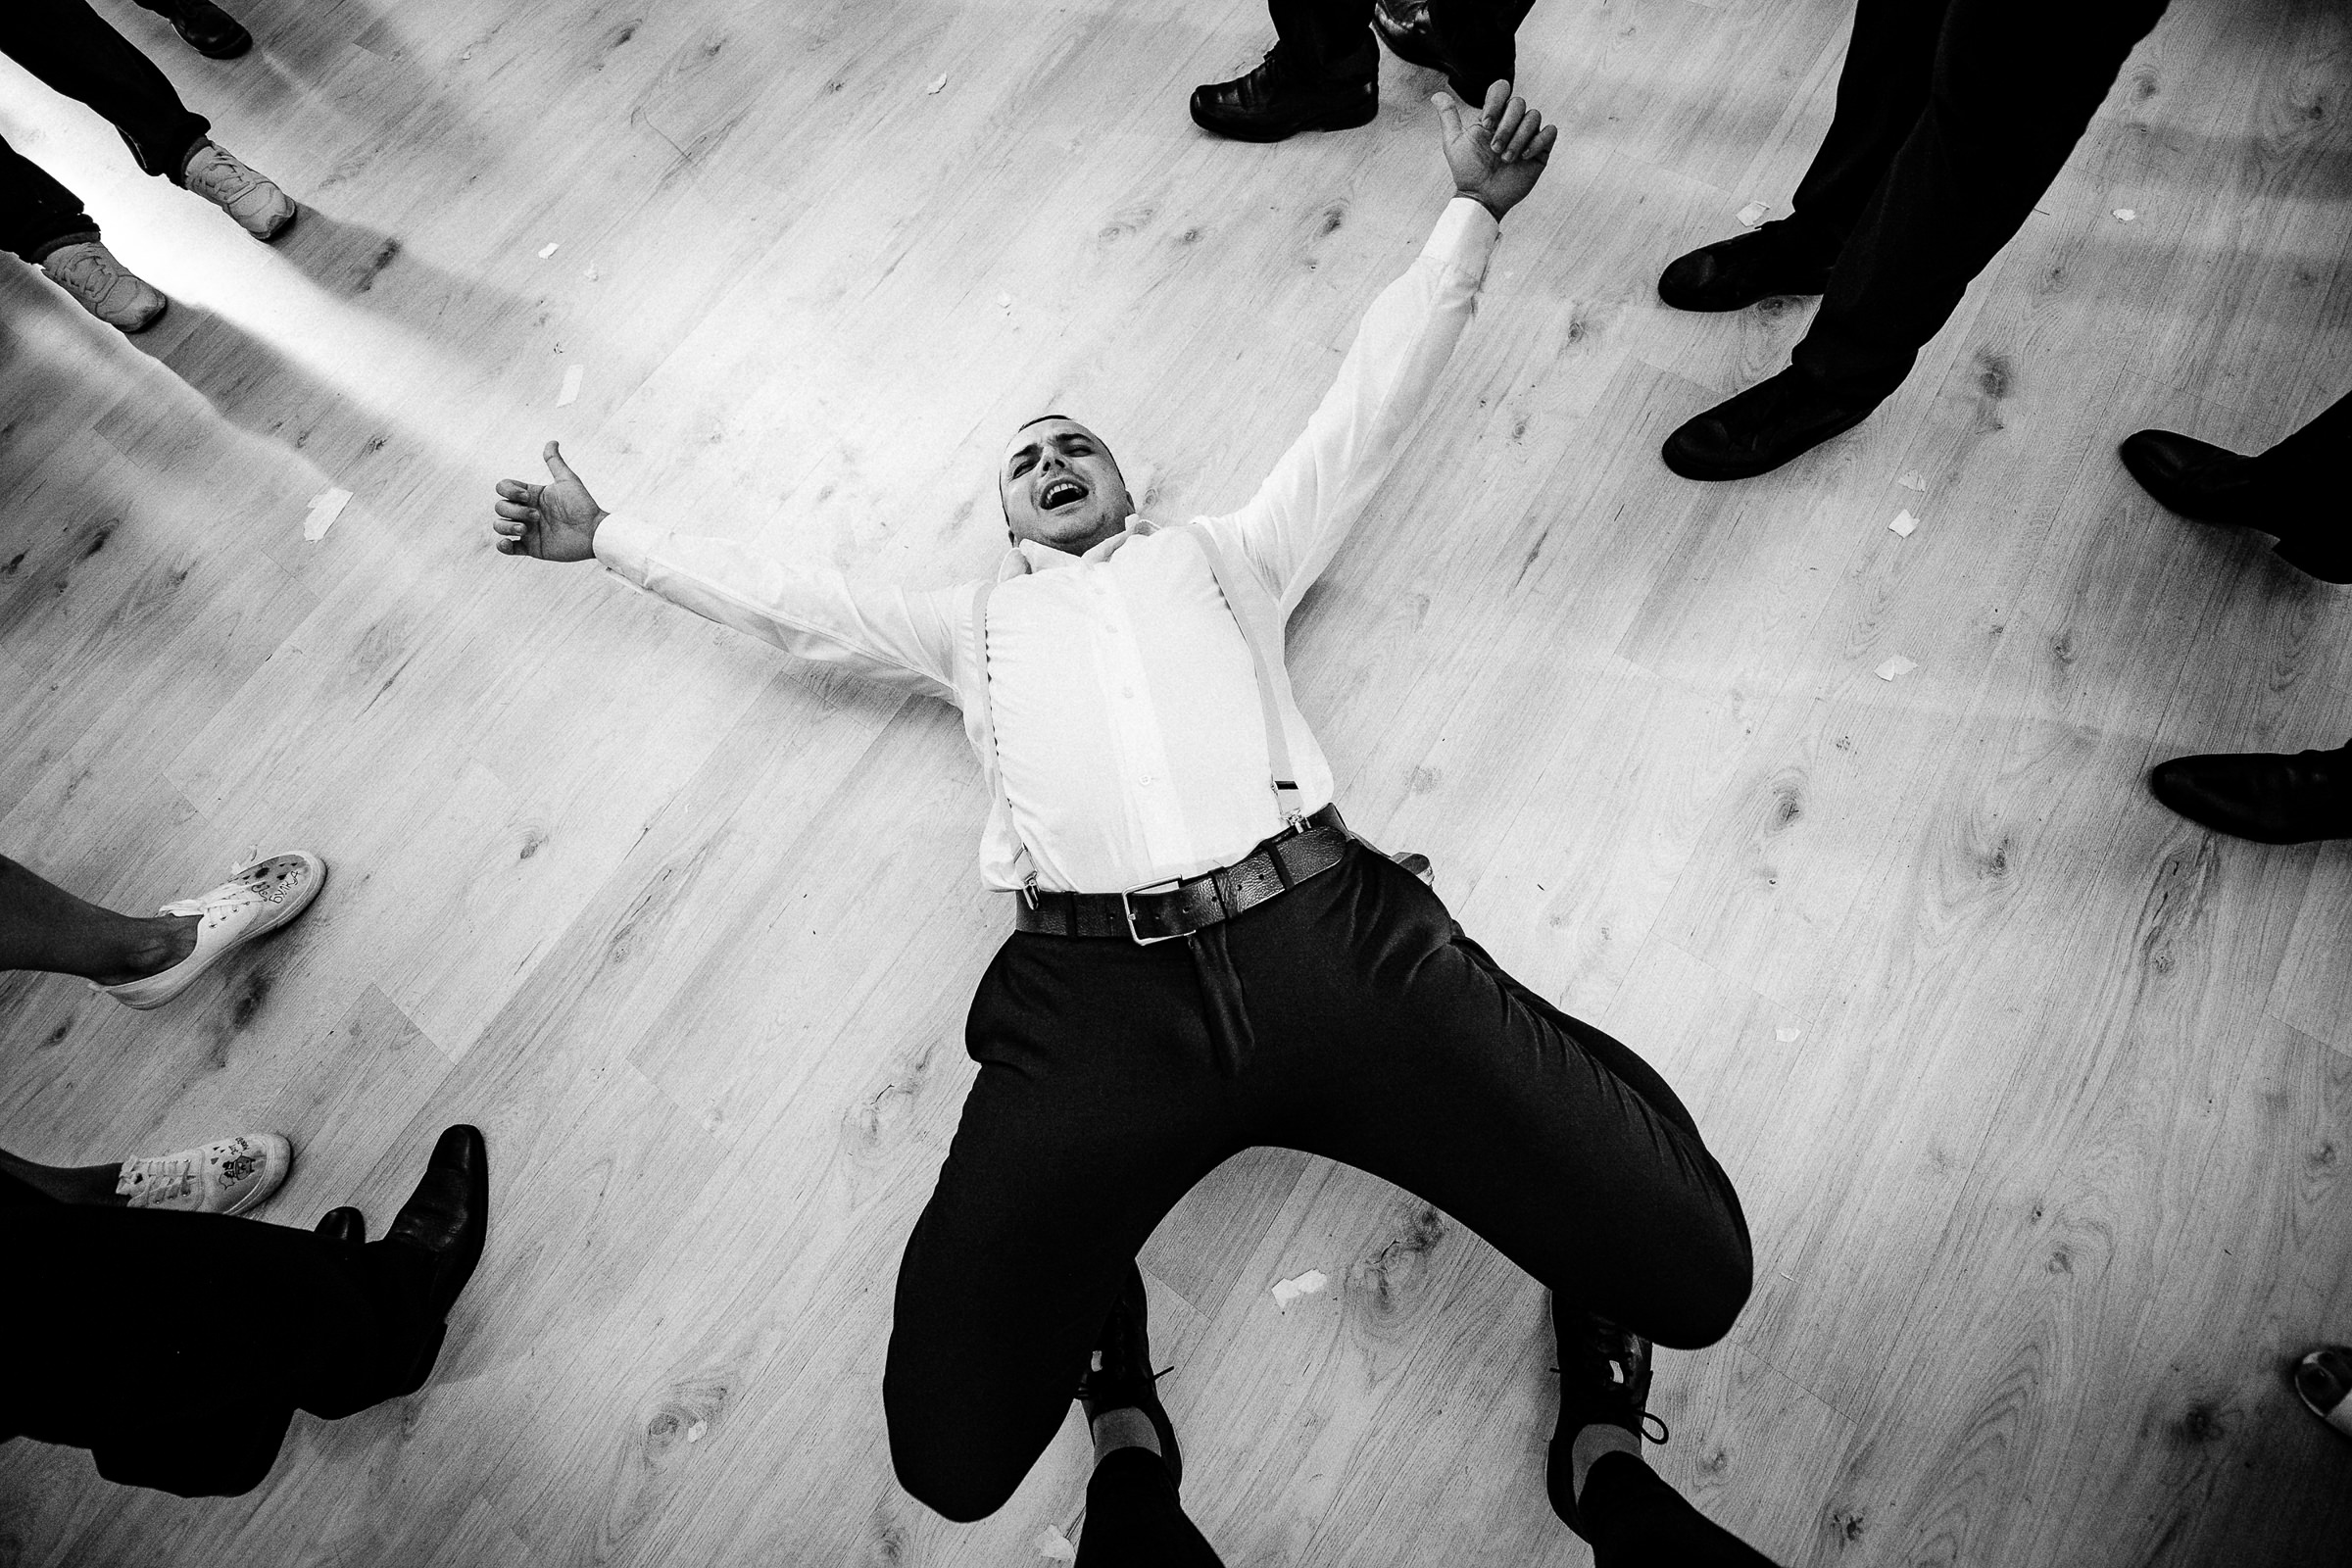 Ecstatic dancer - photo by Deliysky Studio